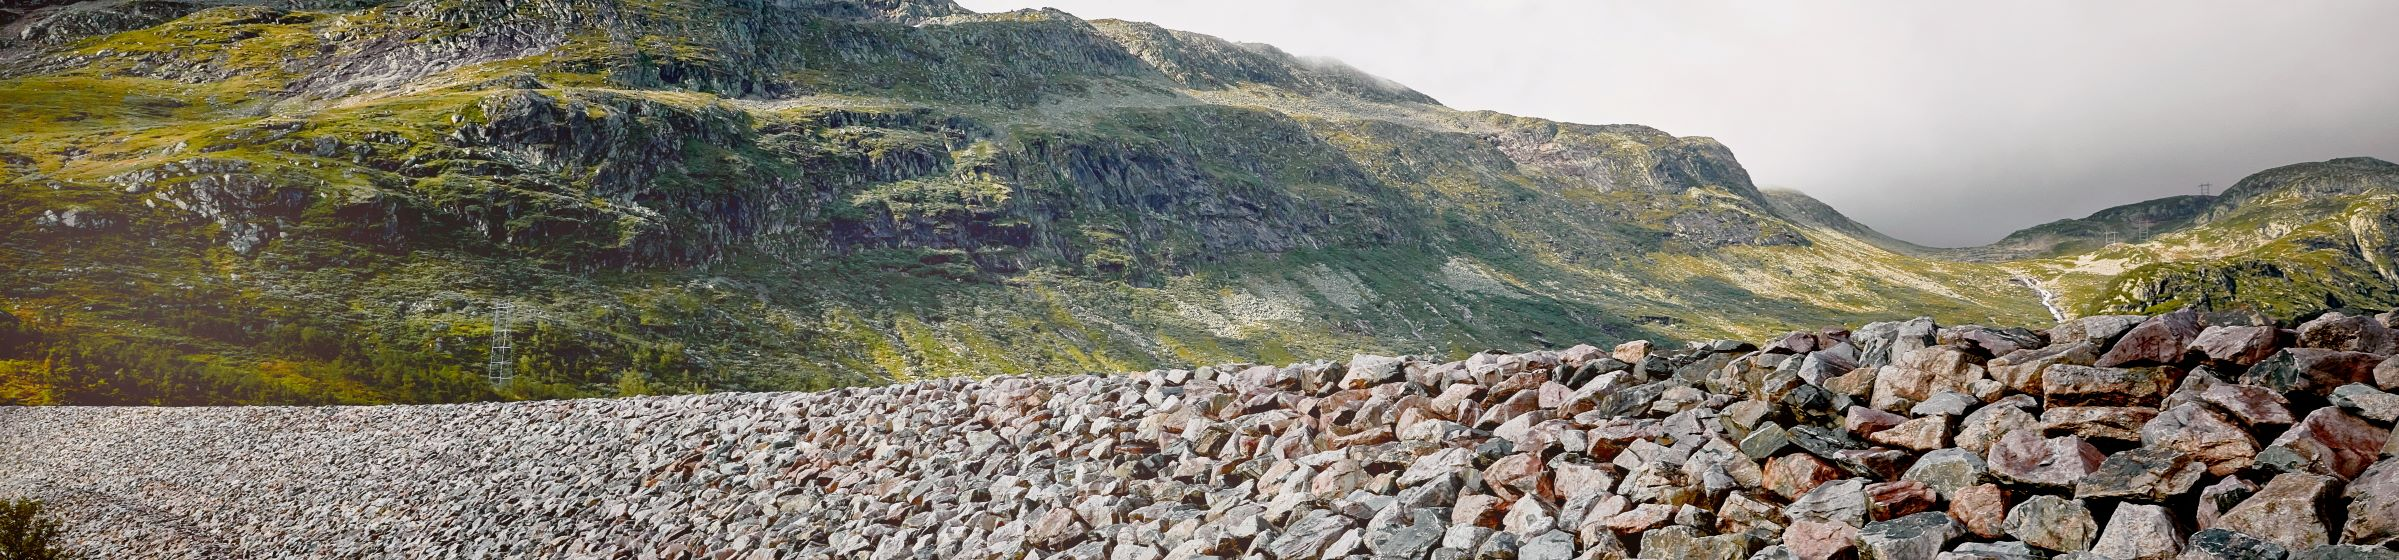 Mountain and dam